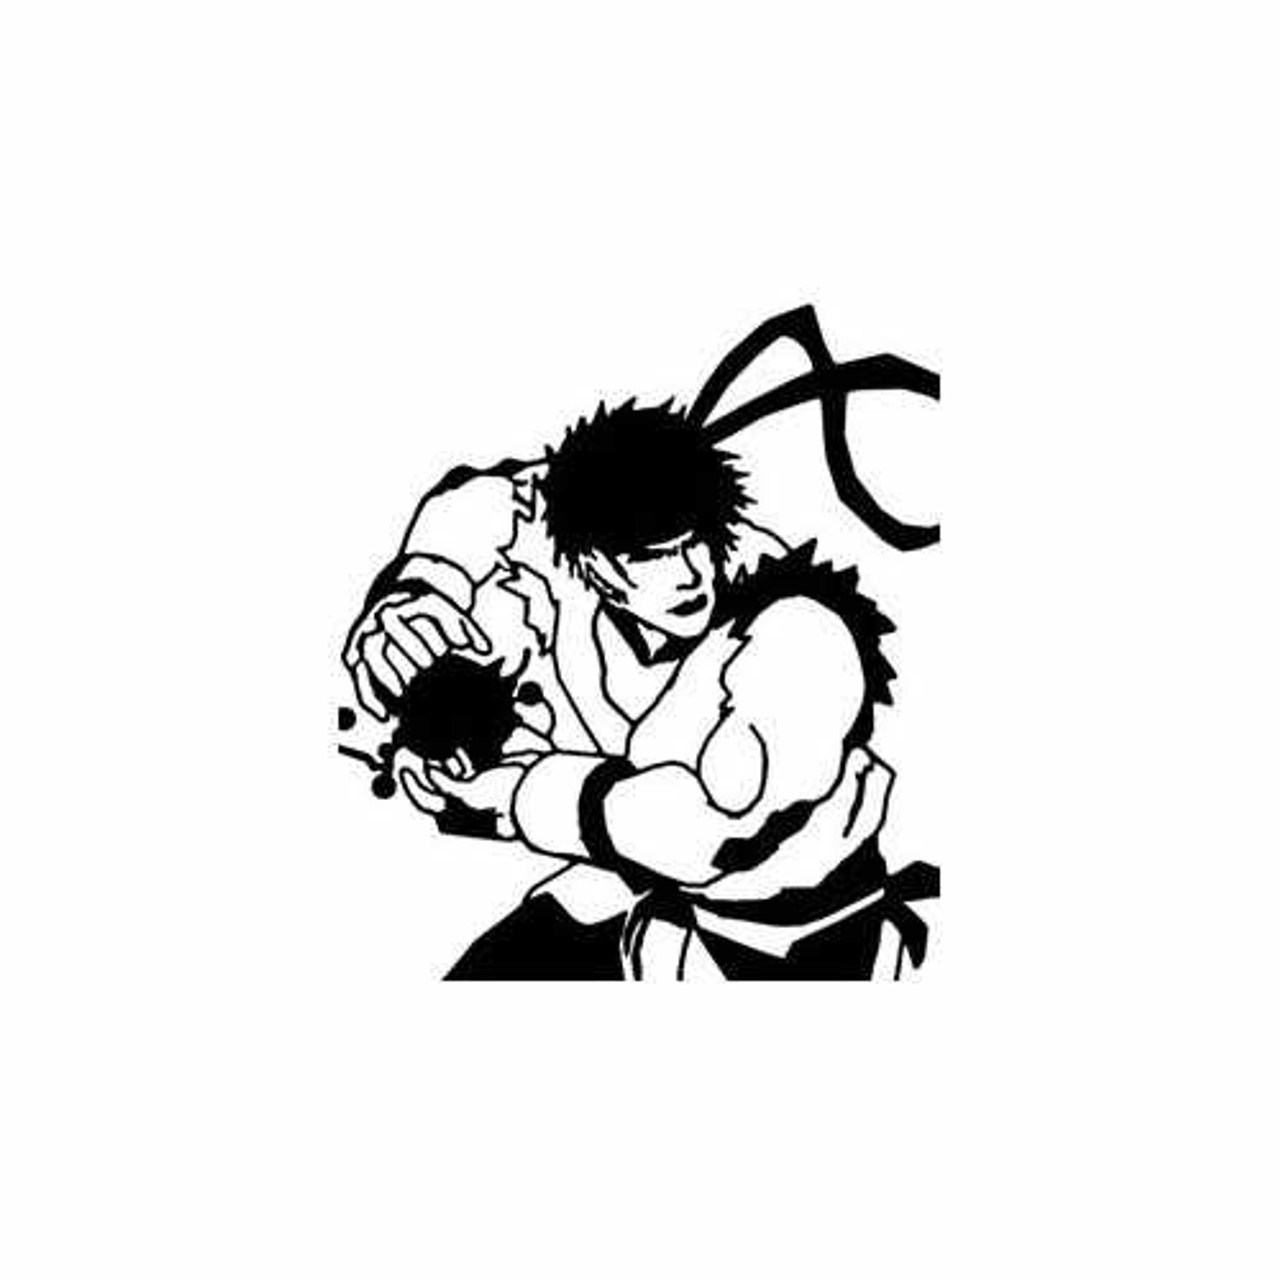 Hadouken Ryu Street Fighter Vinyl Decal Sticker